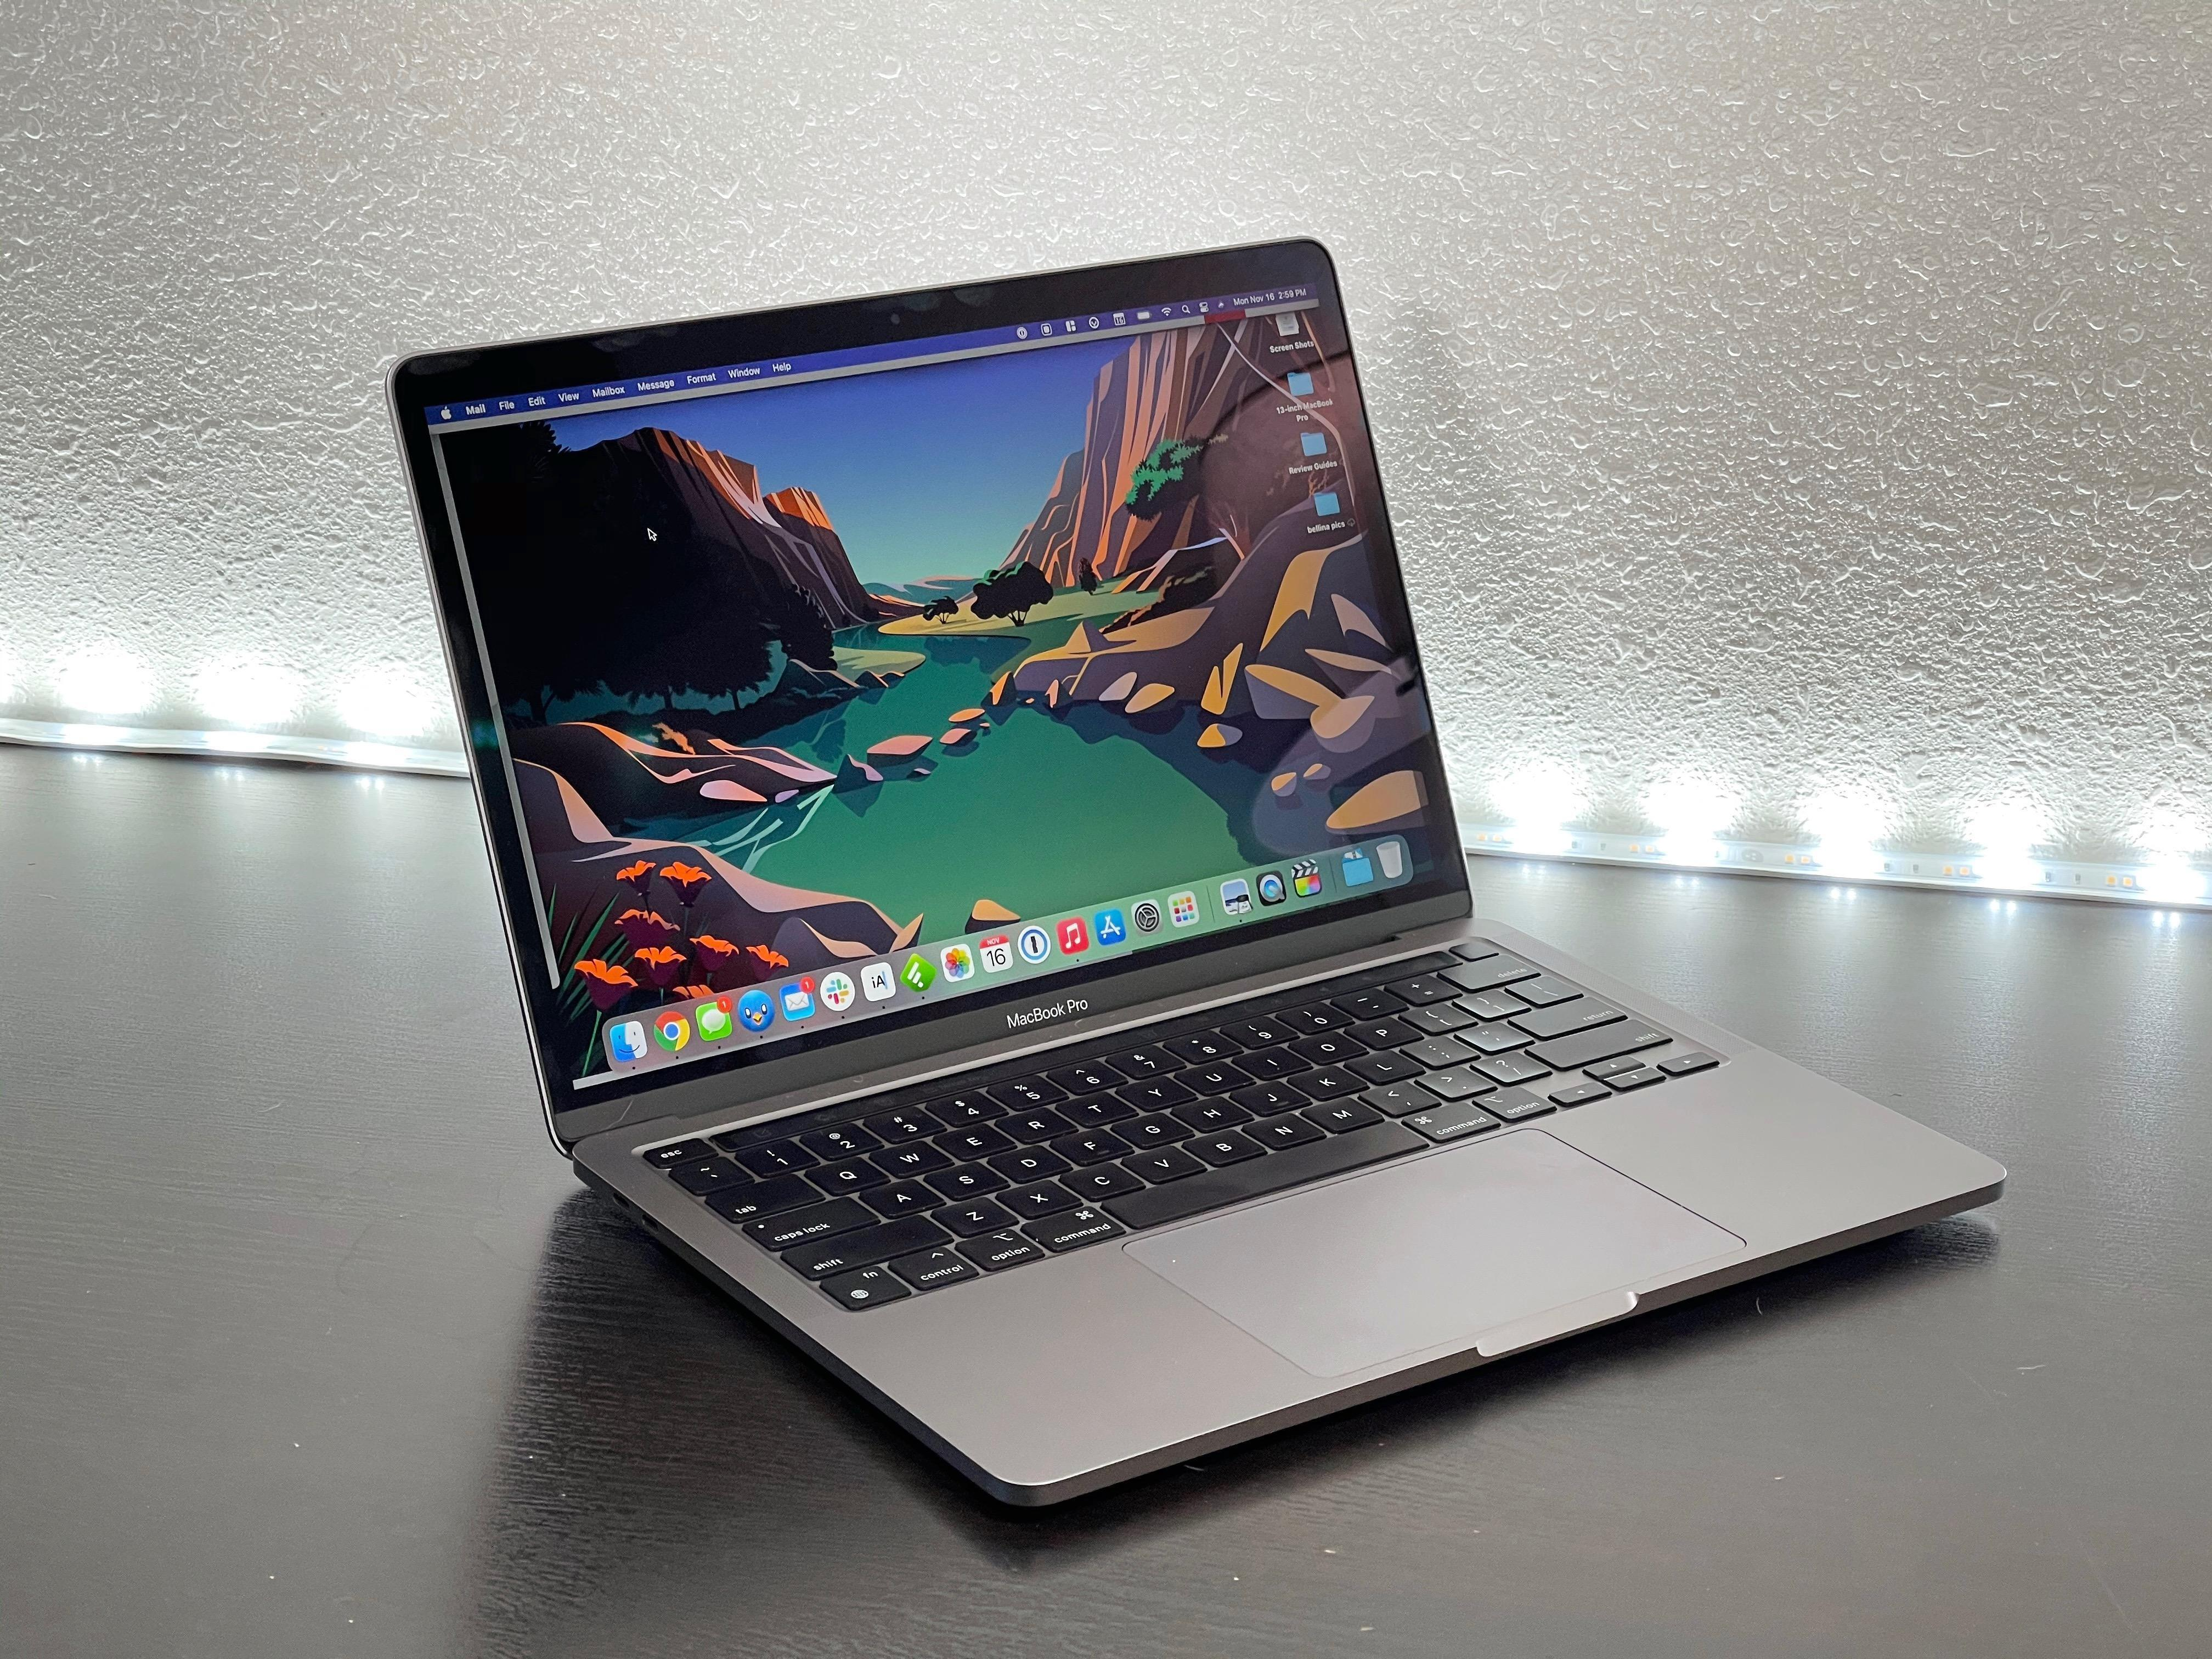 EU//US Silicon for MacBook Pro 13 15 CD ROM Keyboard Cover Silicon English for MacBook Pro 13 15 Keyboard Cover-EU Clear